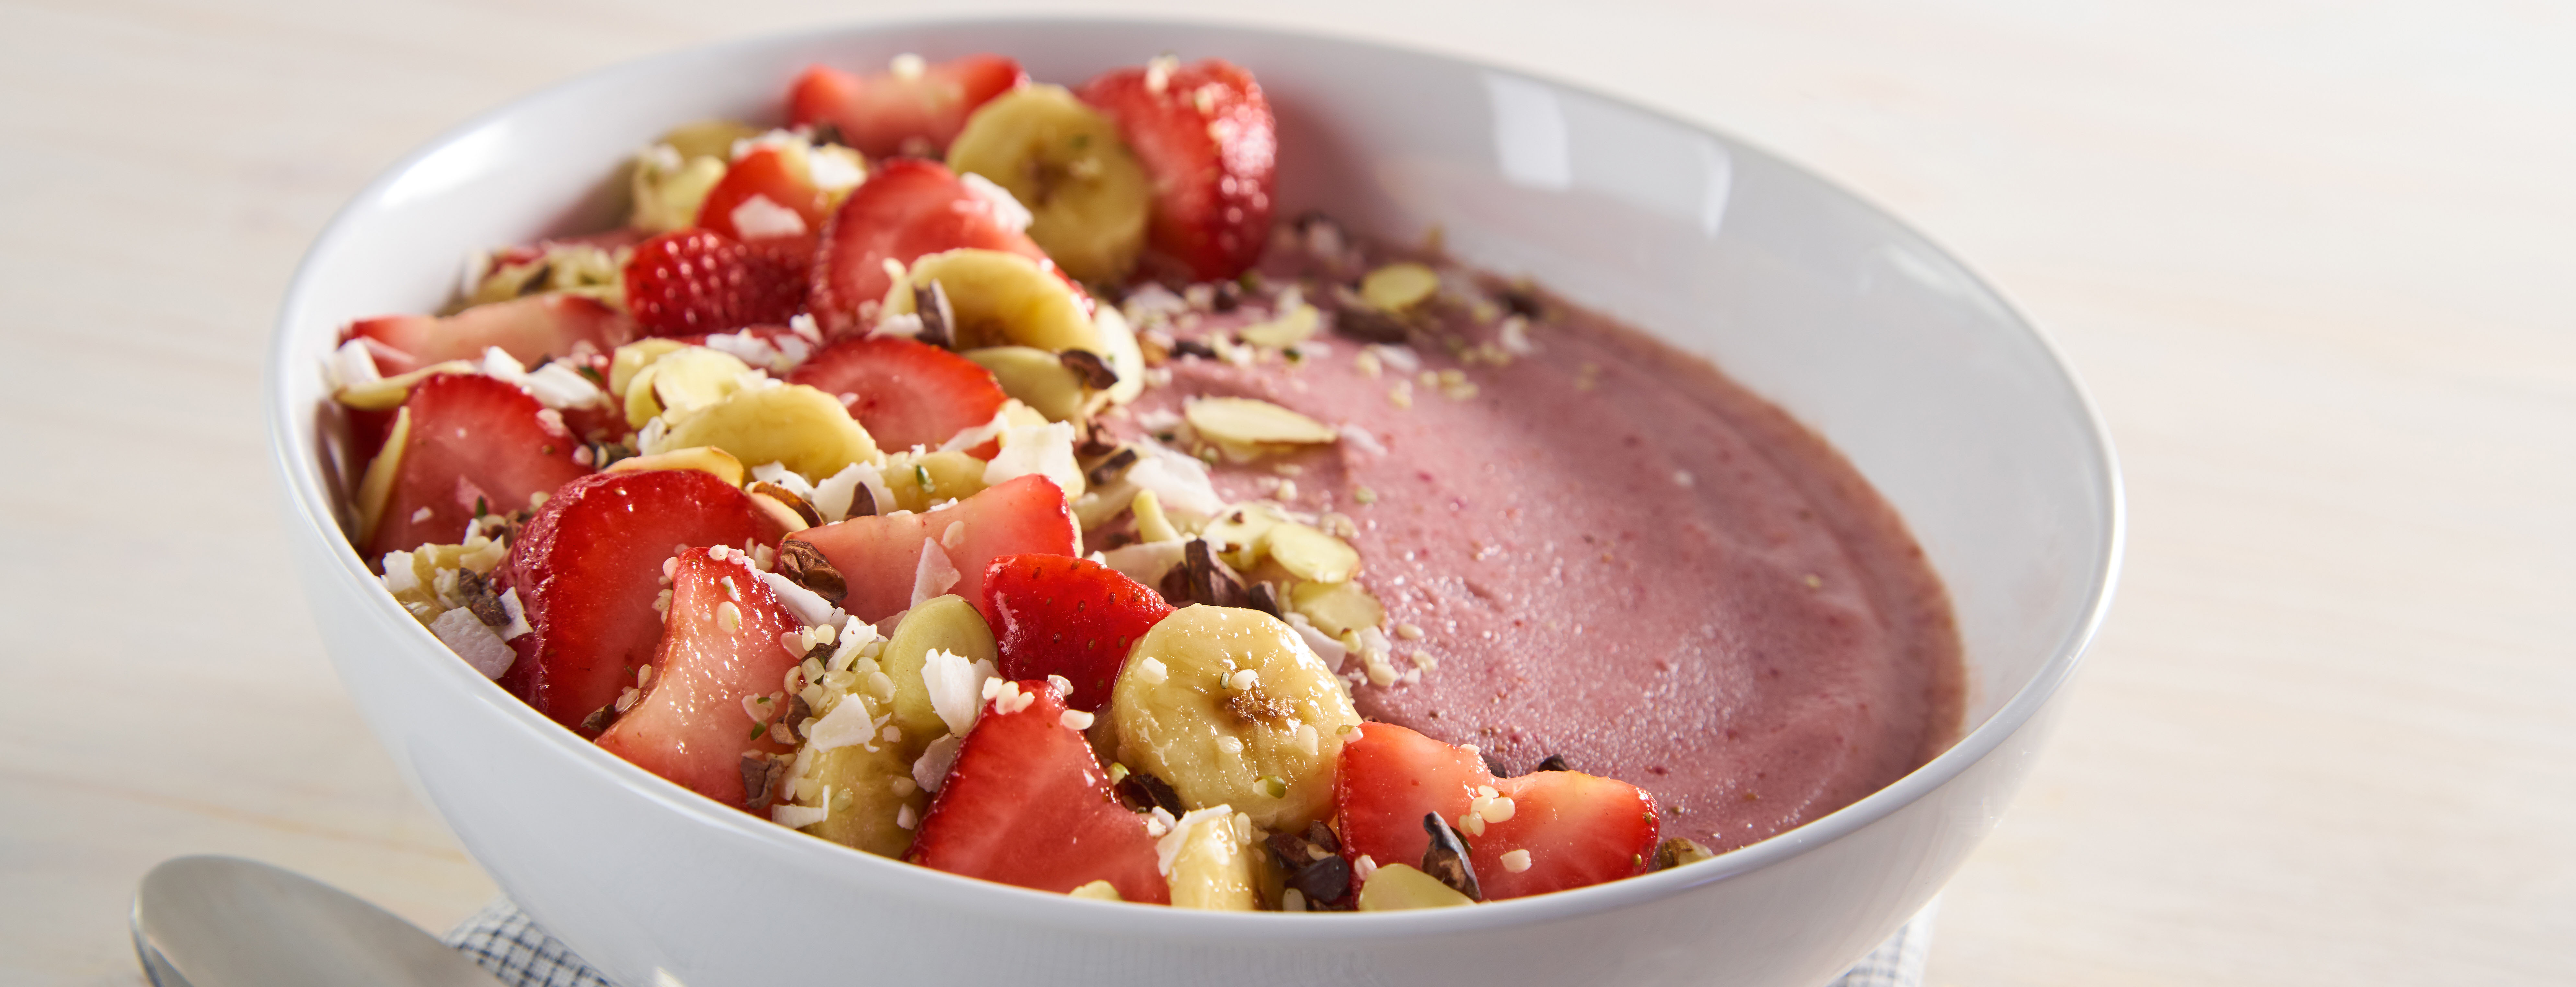 Photo of Strawberry Banana Smoothie Bowl